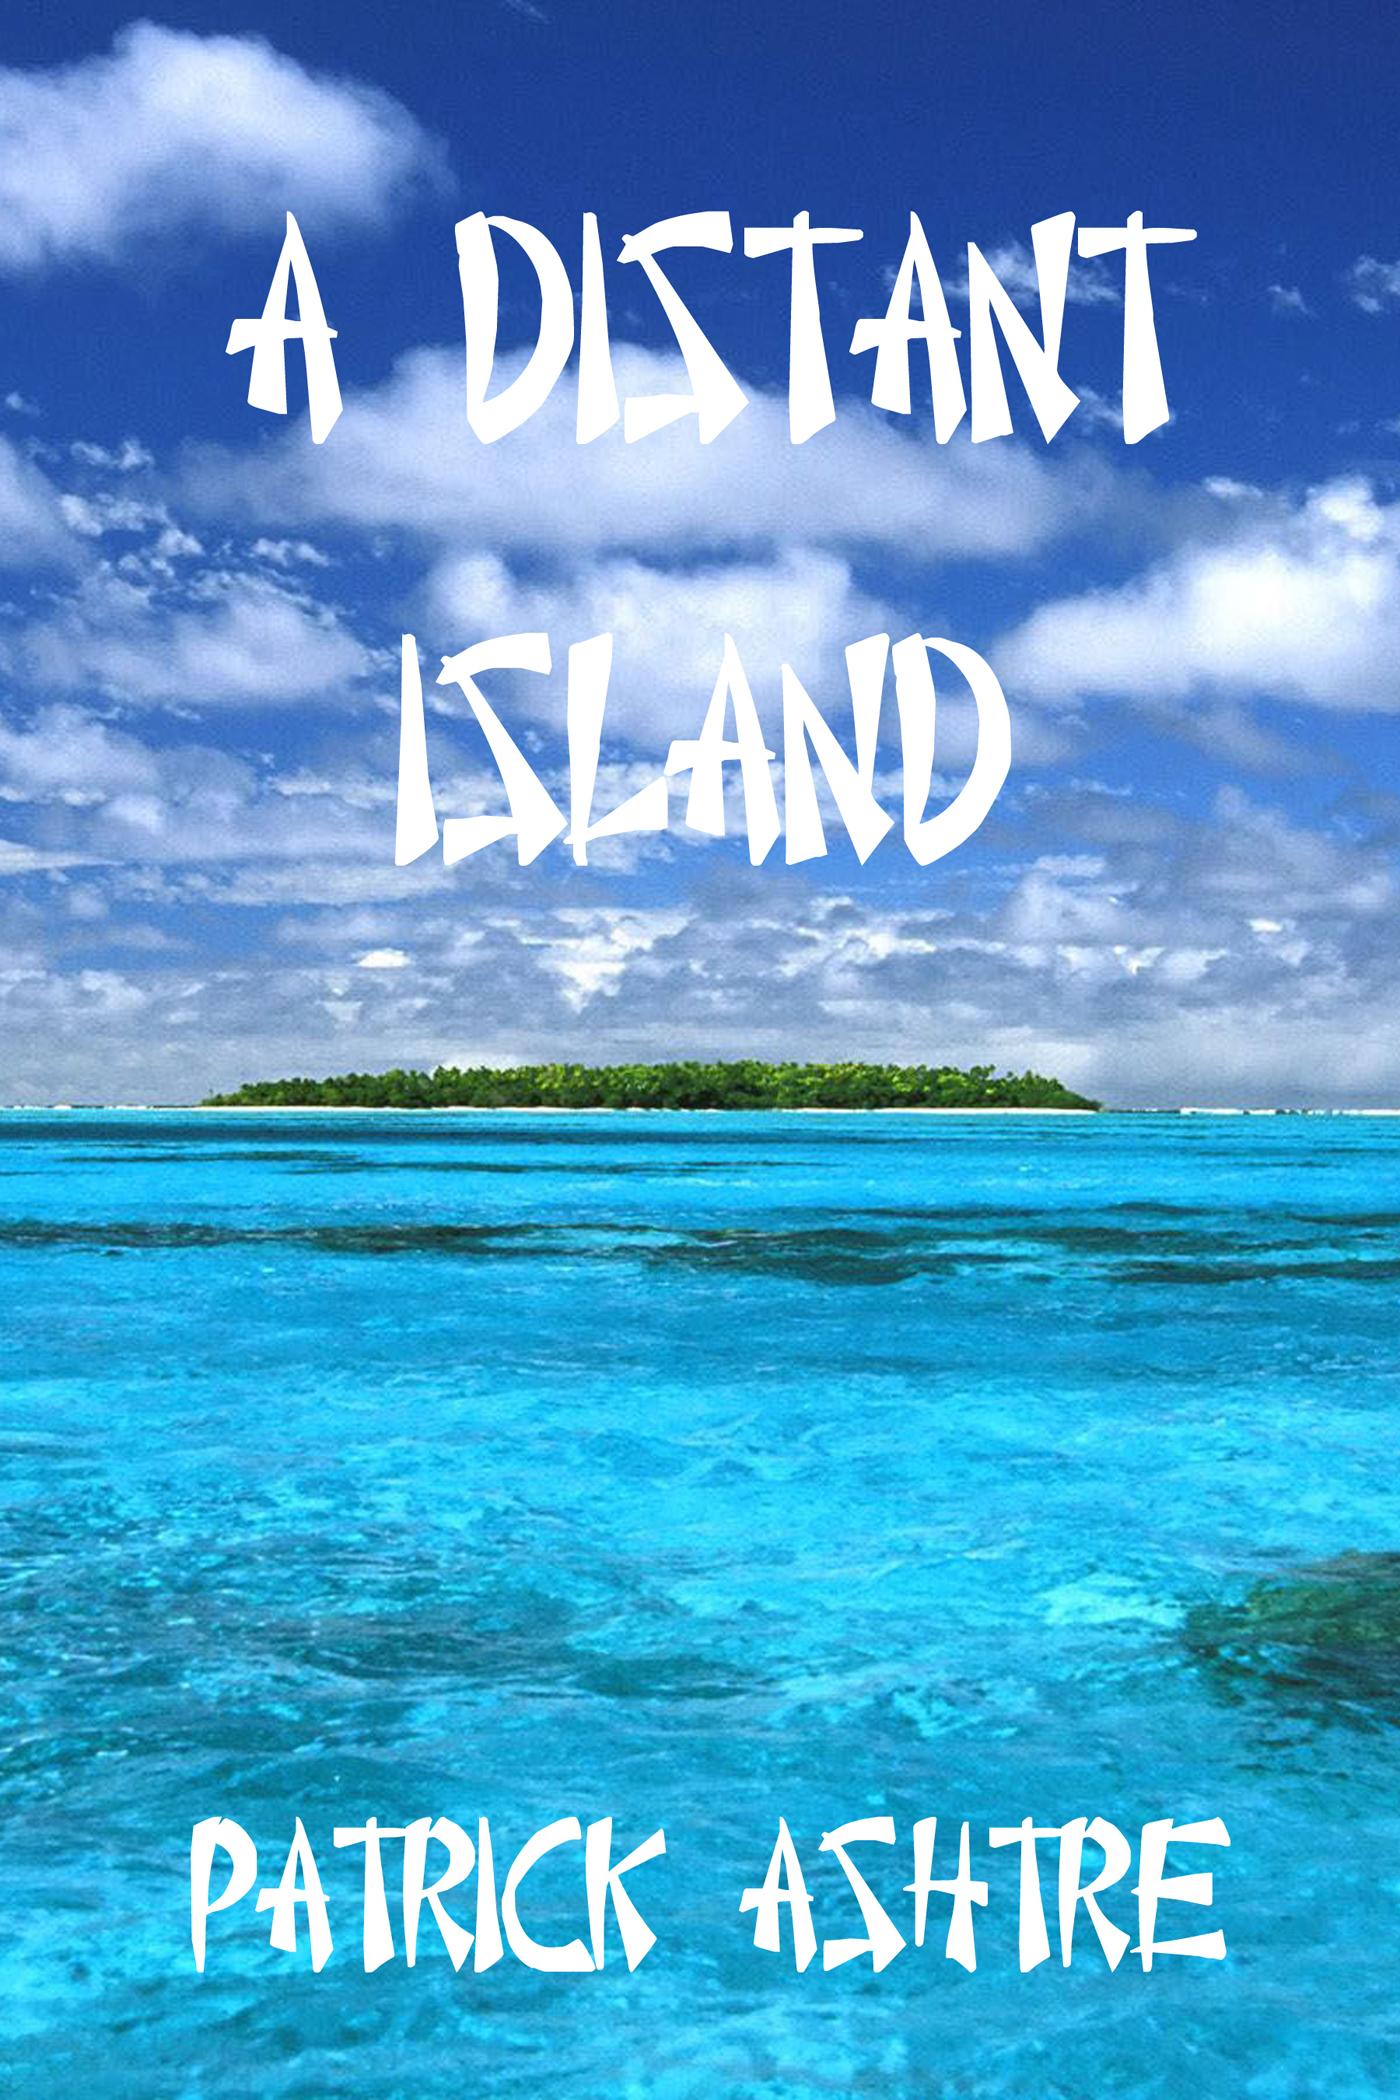 A Distant Island  by  Patrick Ashtre